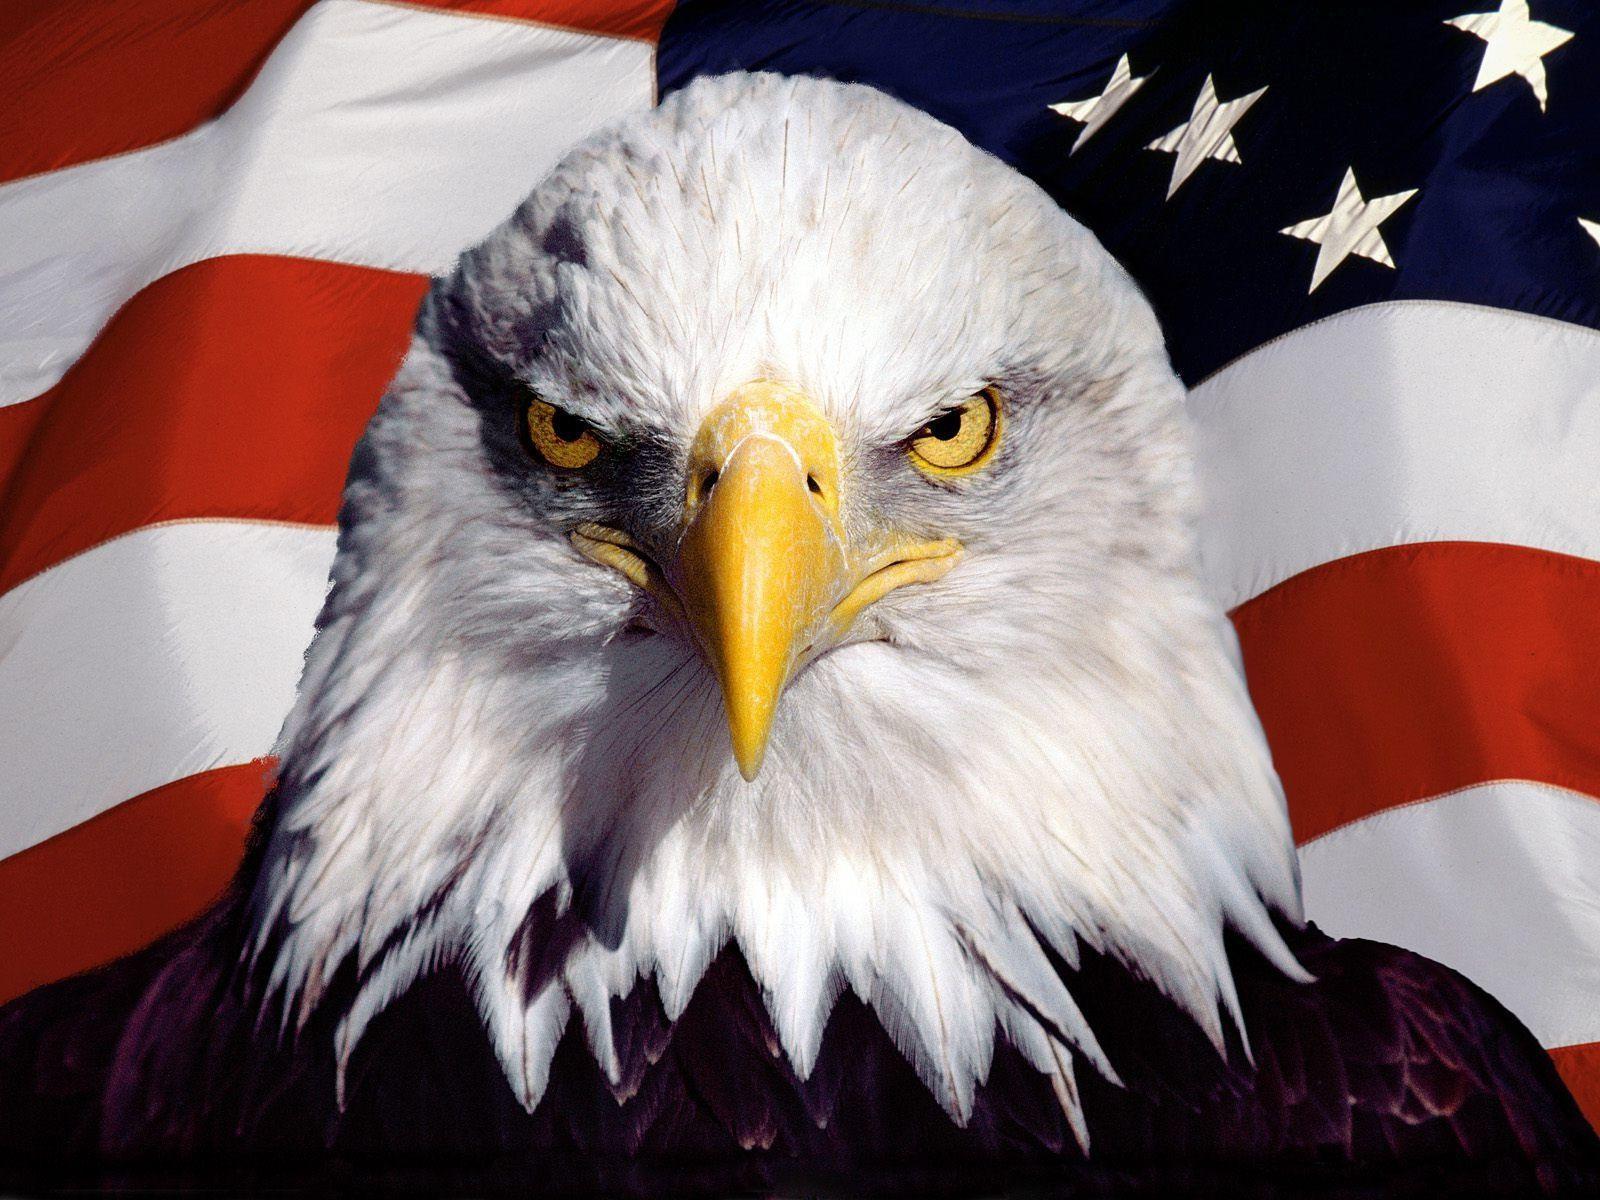 American Bald Eagle Wallpapers 1600x1200